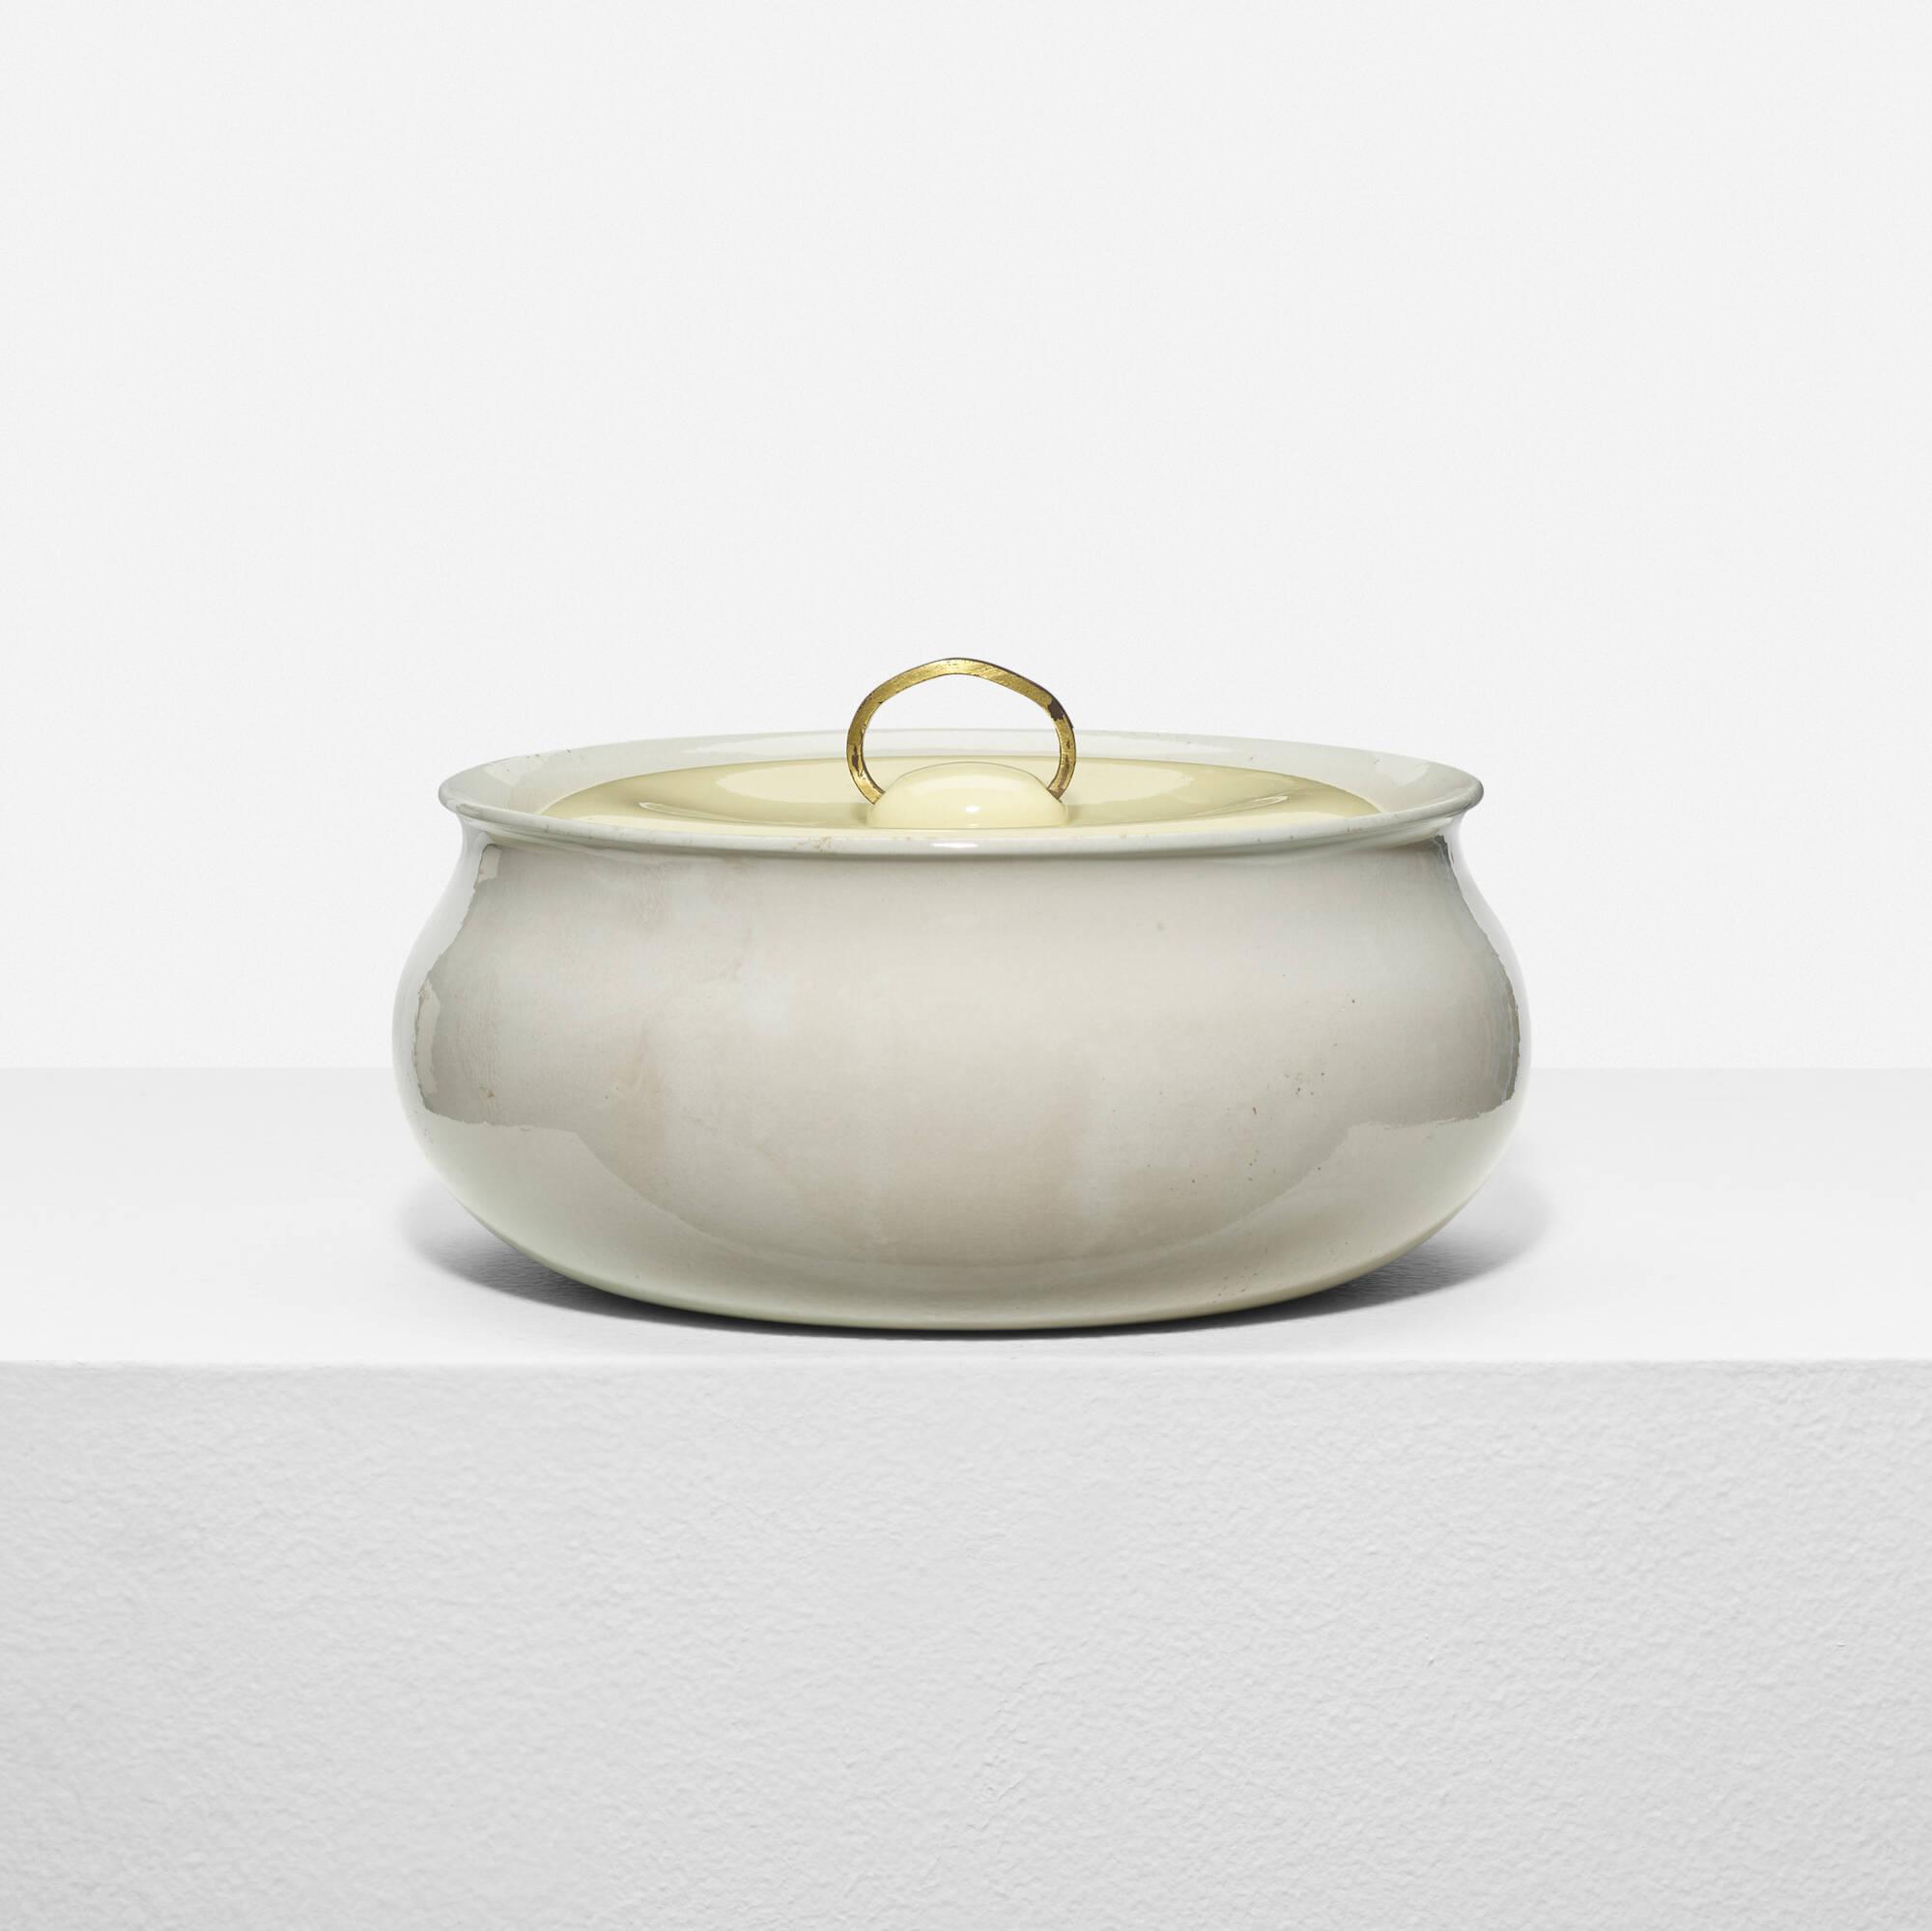 324: Eva Zeisel / lidded casserole dish (1 of 2)